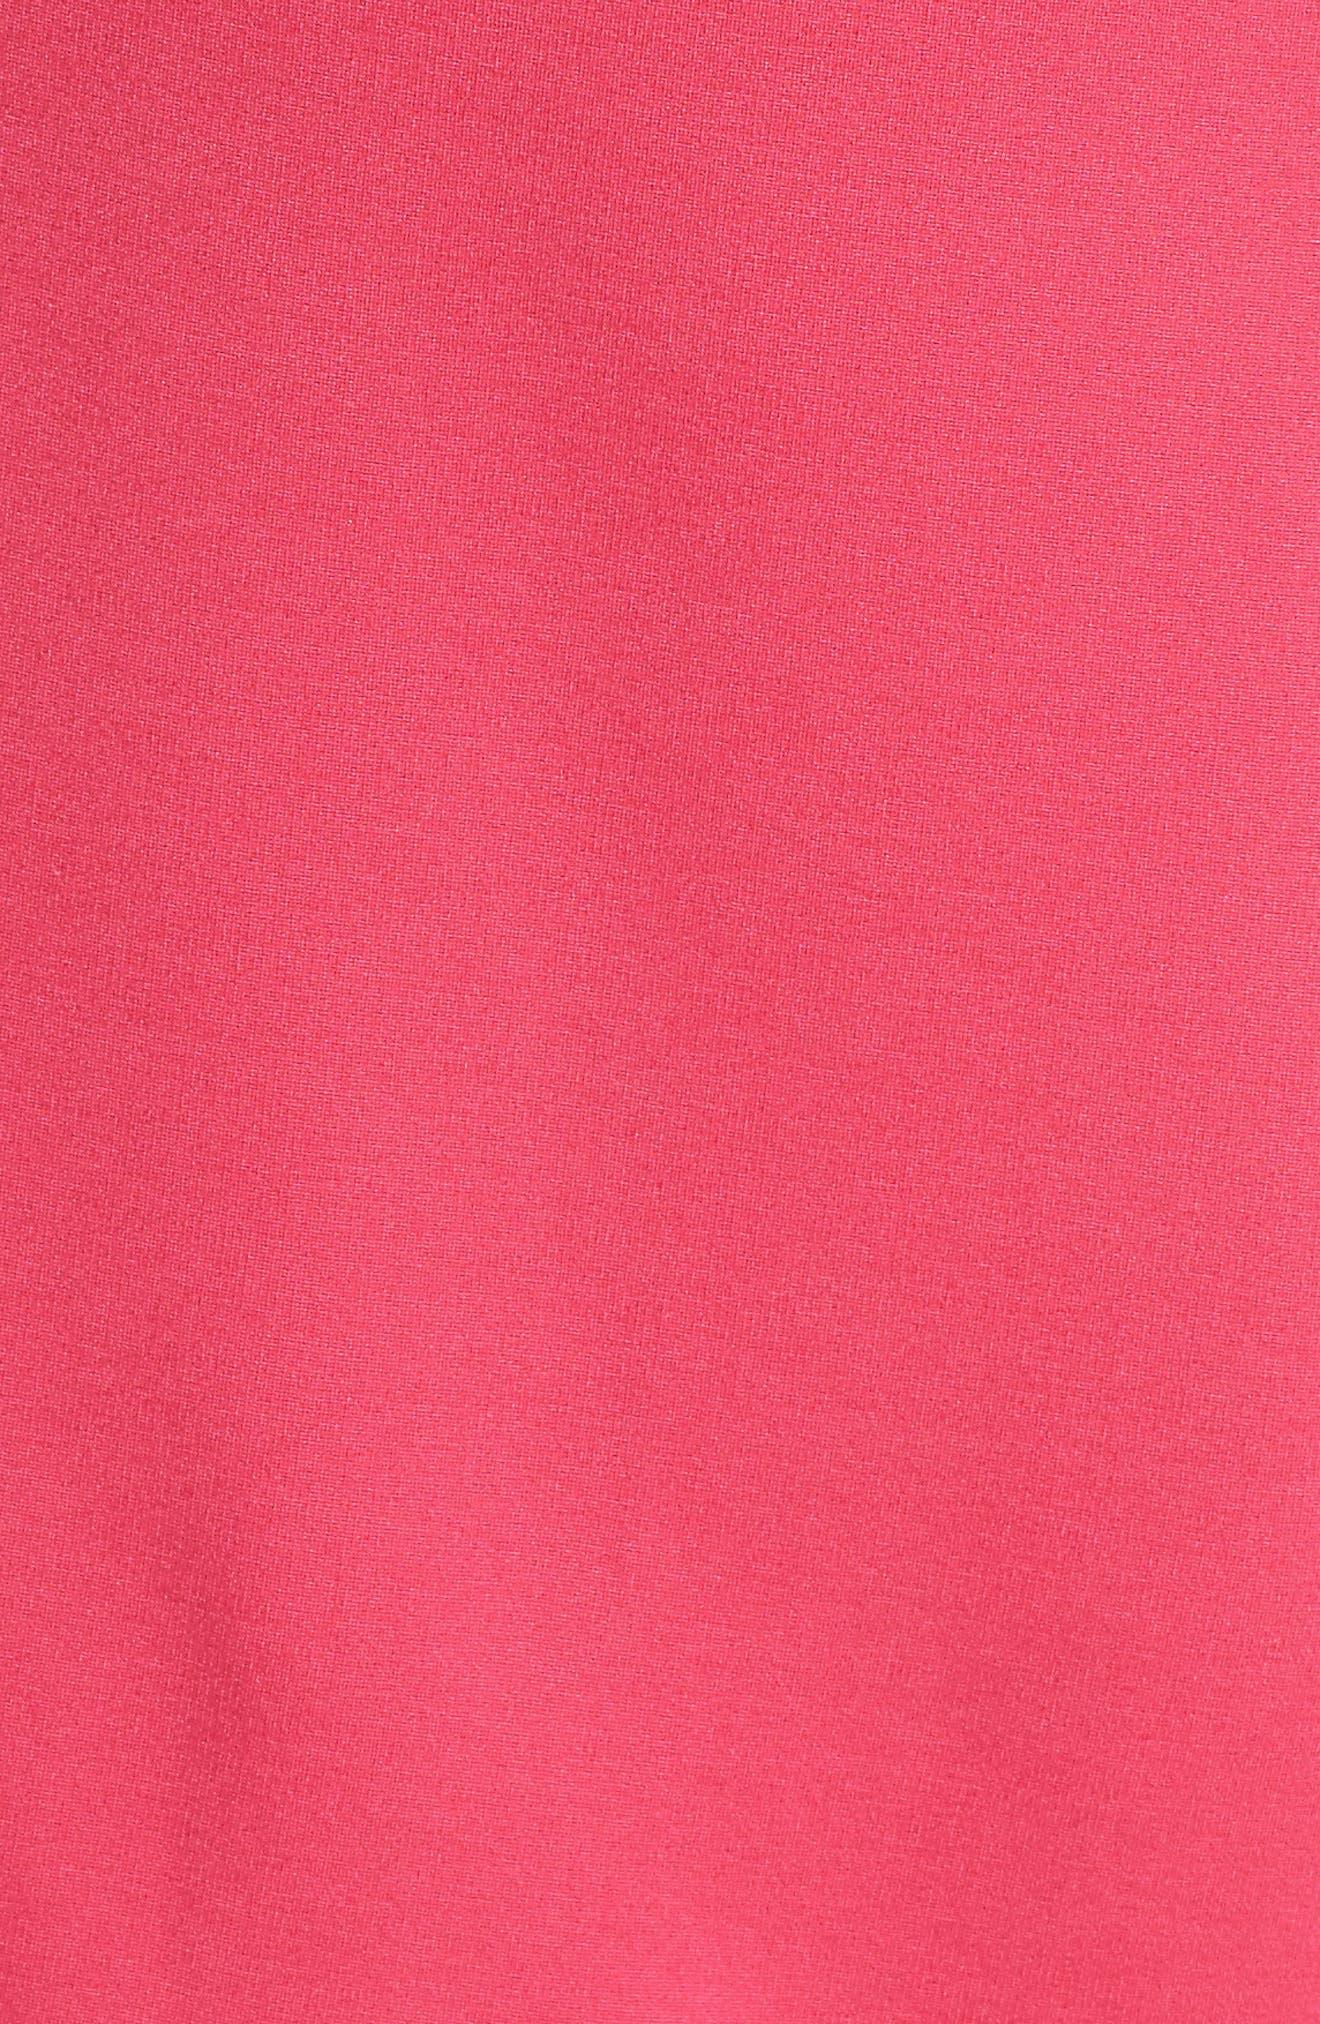 Asymmetric Sheath Dress,                             Alternate thumbnail 5, color,                             Pink Lilac